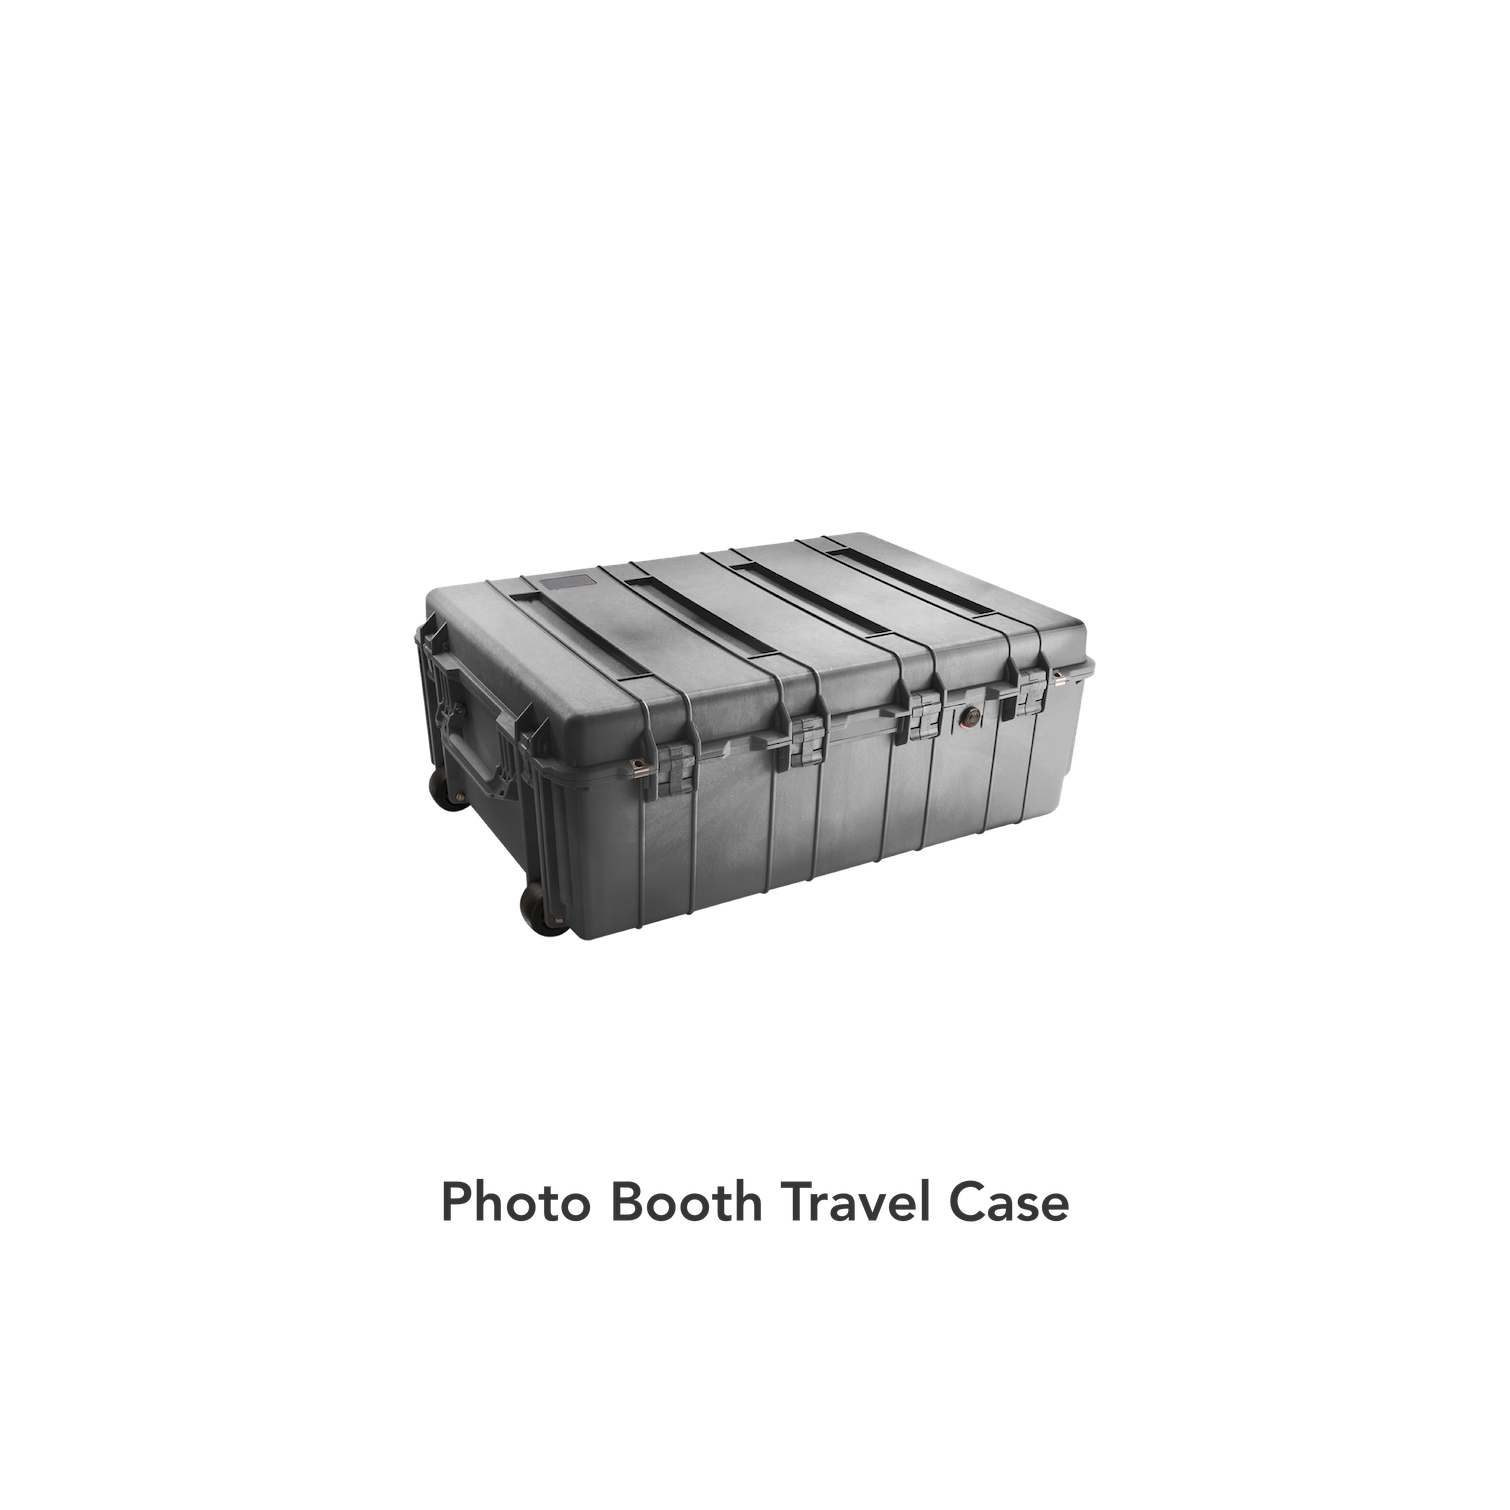 photobooth case